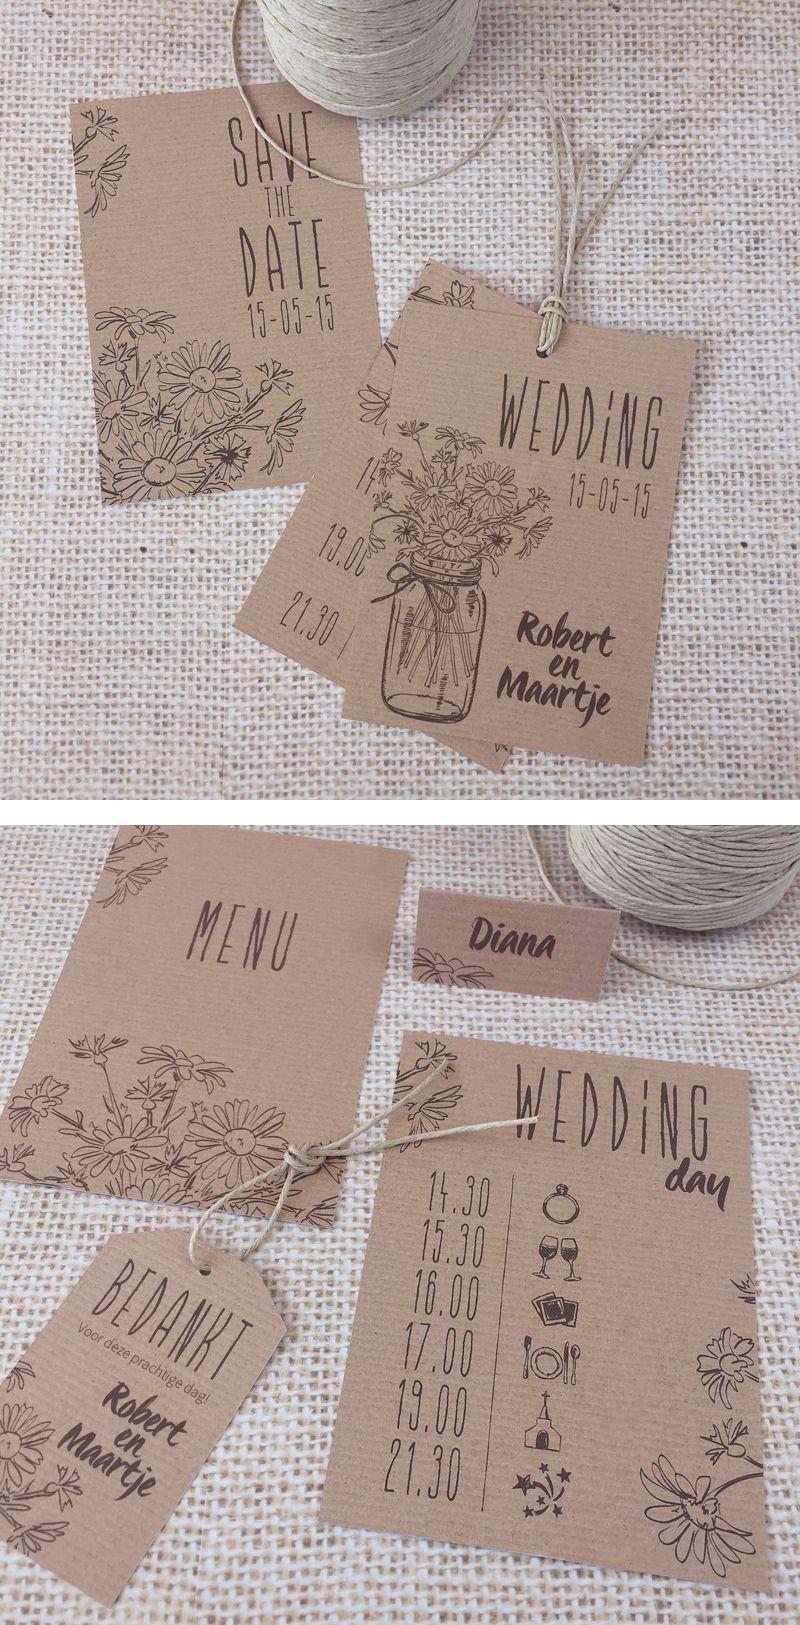 Weddingstationery • Rustic wedding • Trouwkaart • studiosproet.com